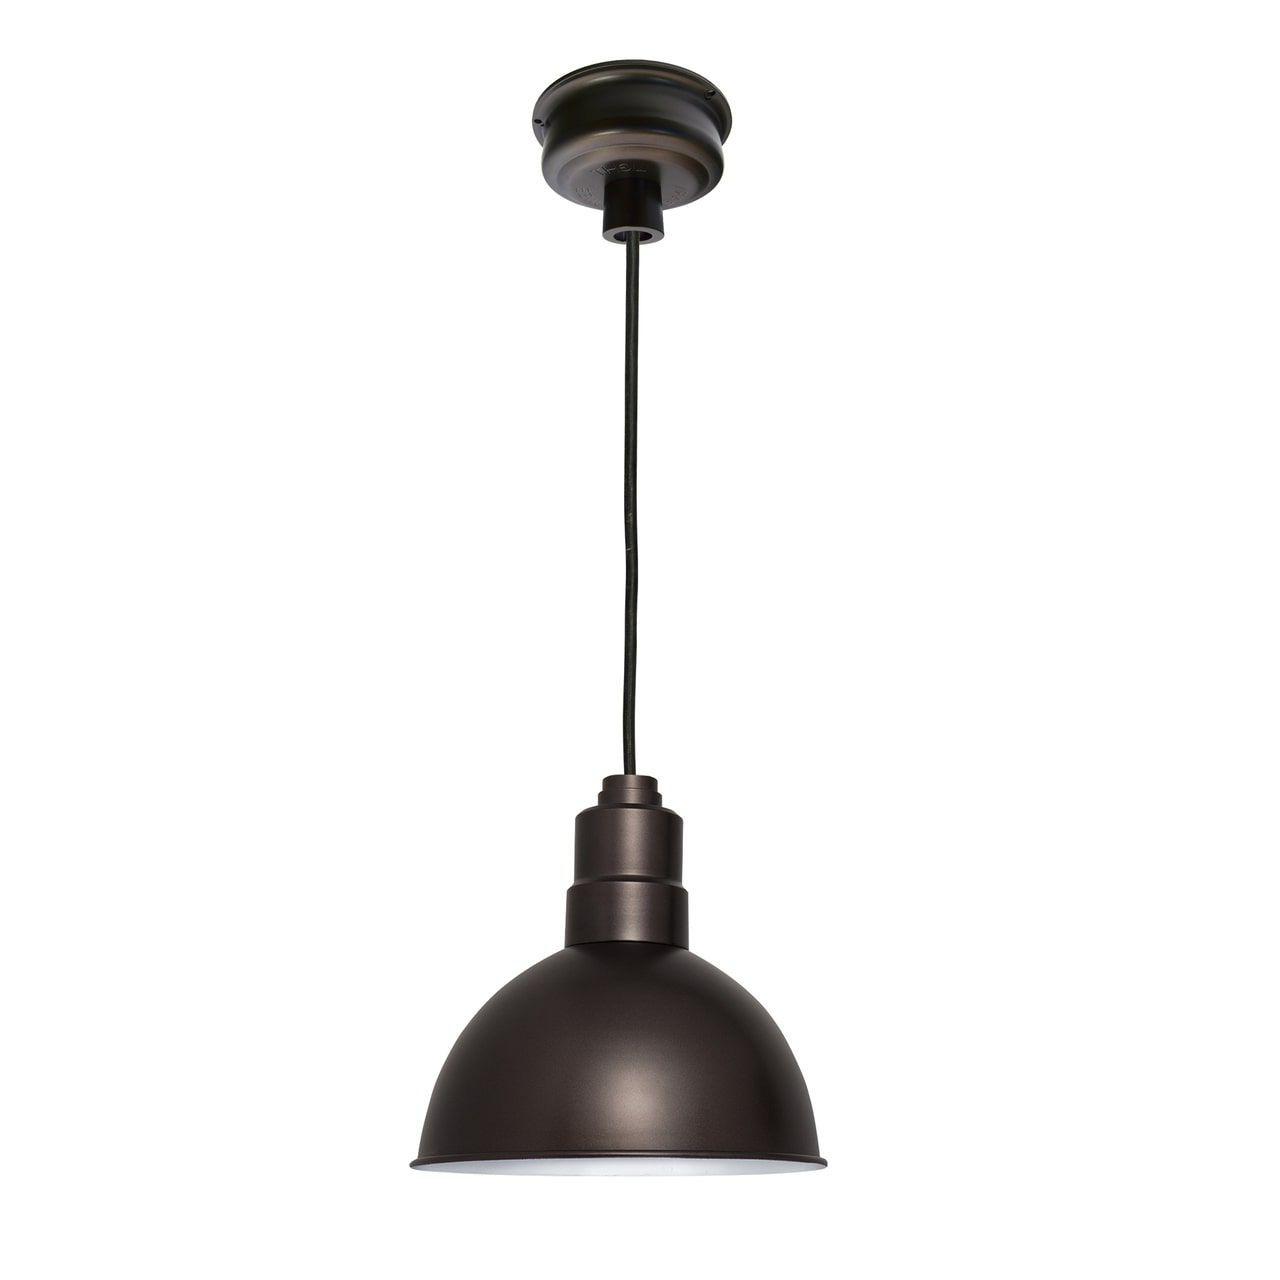 "Popular Conover 1 Light Dome Pendants In 10"" Blackspot Led Pendant Light In Mahogany Bronze In  (View 15 of 20)"